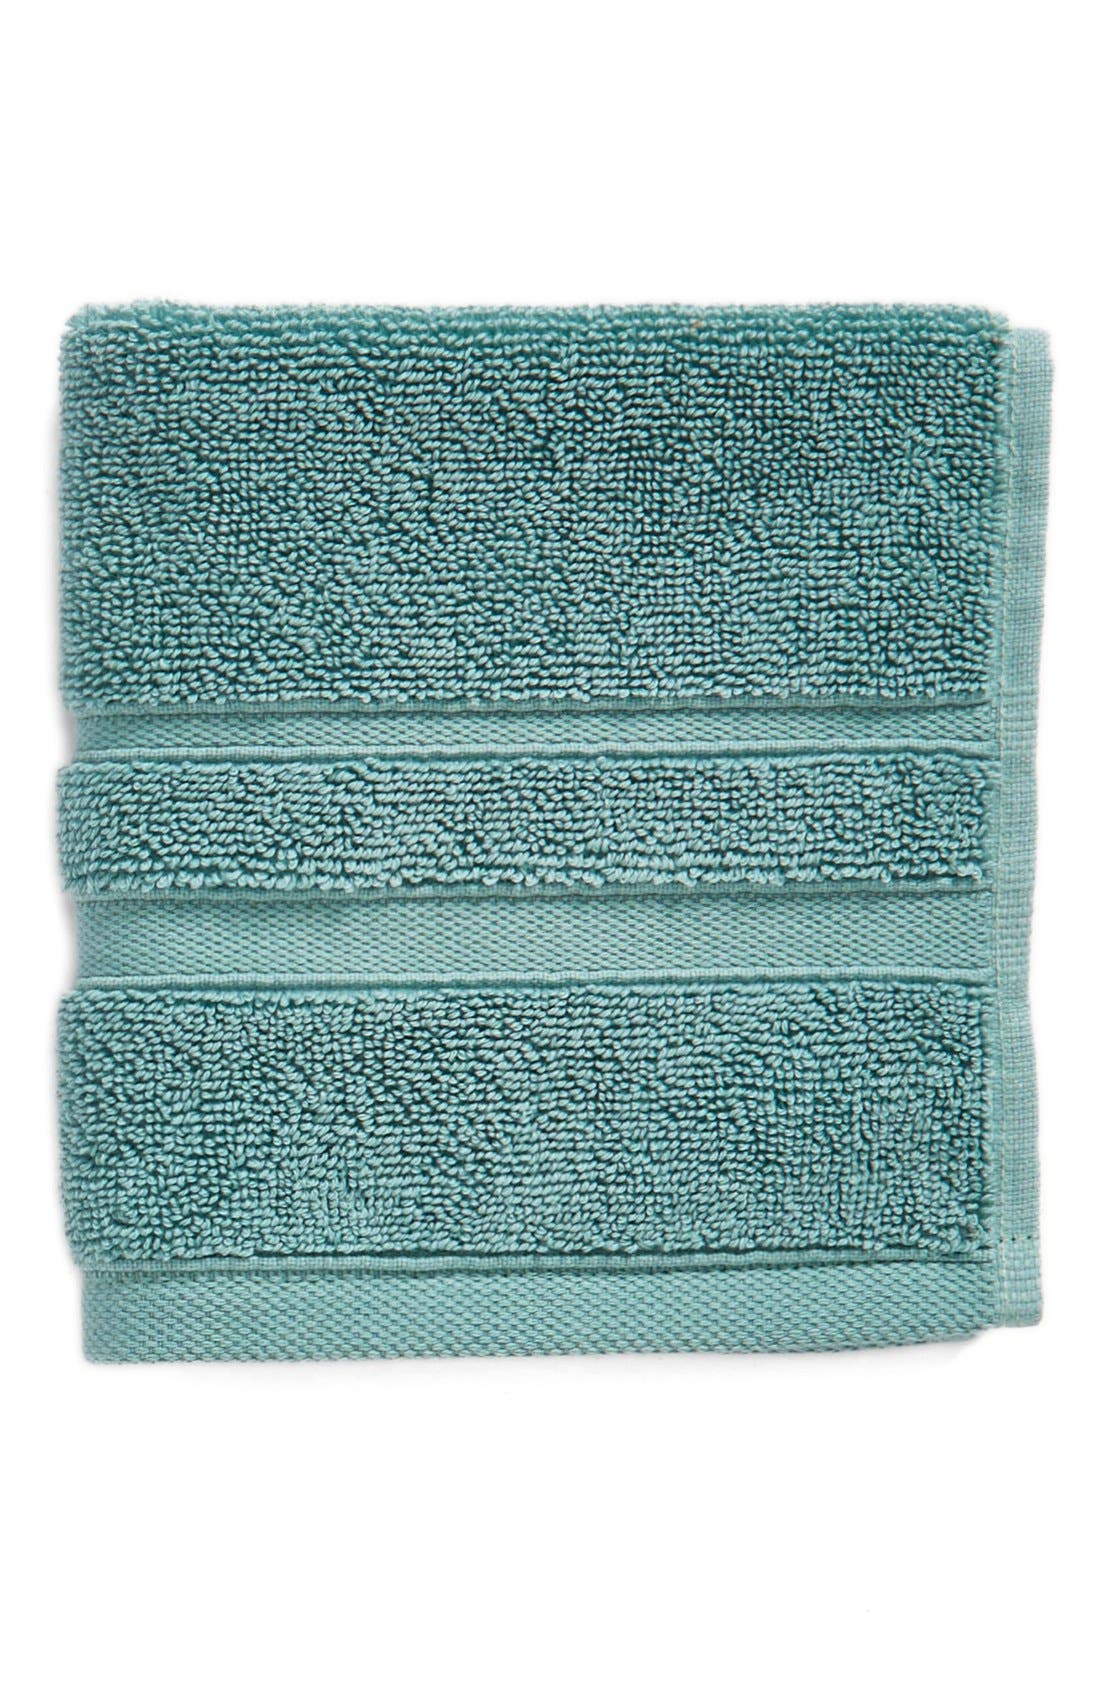 Main Image - Waterworks Studio 'Perennial' Combed Turkish Cotton Washcloth (Online Only)